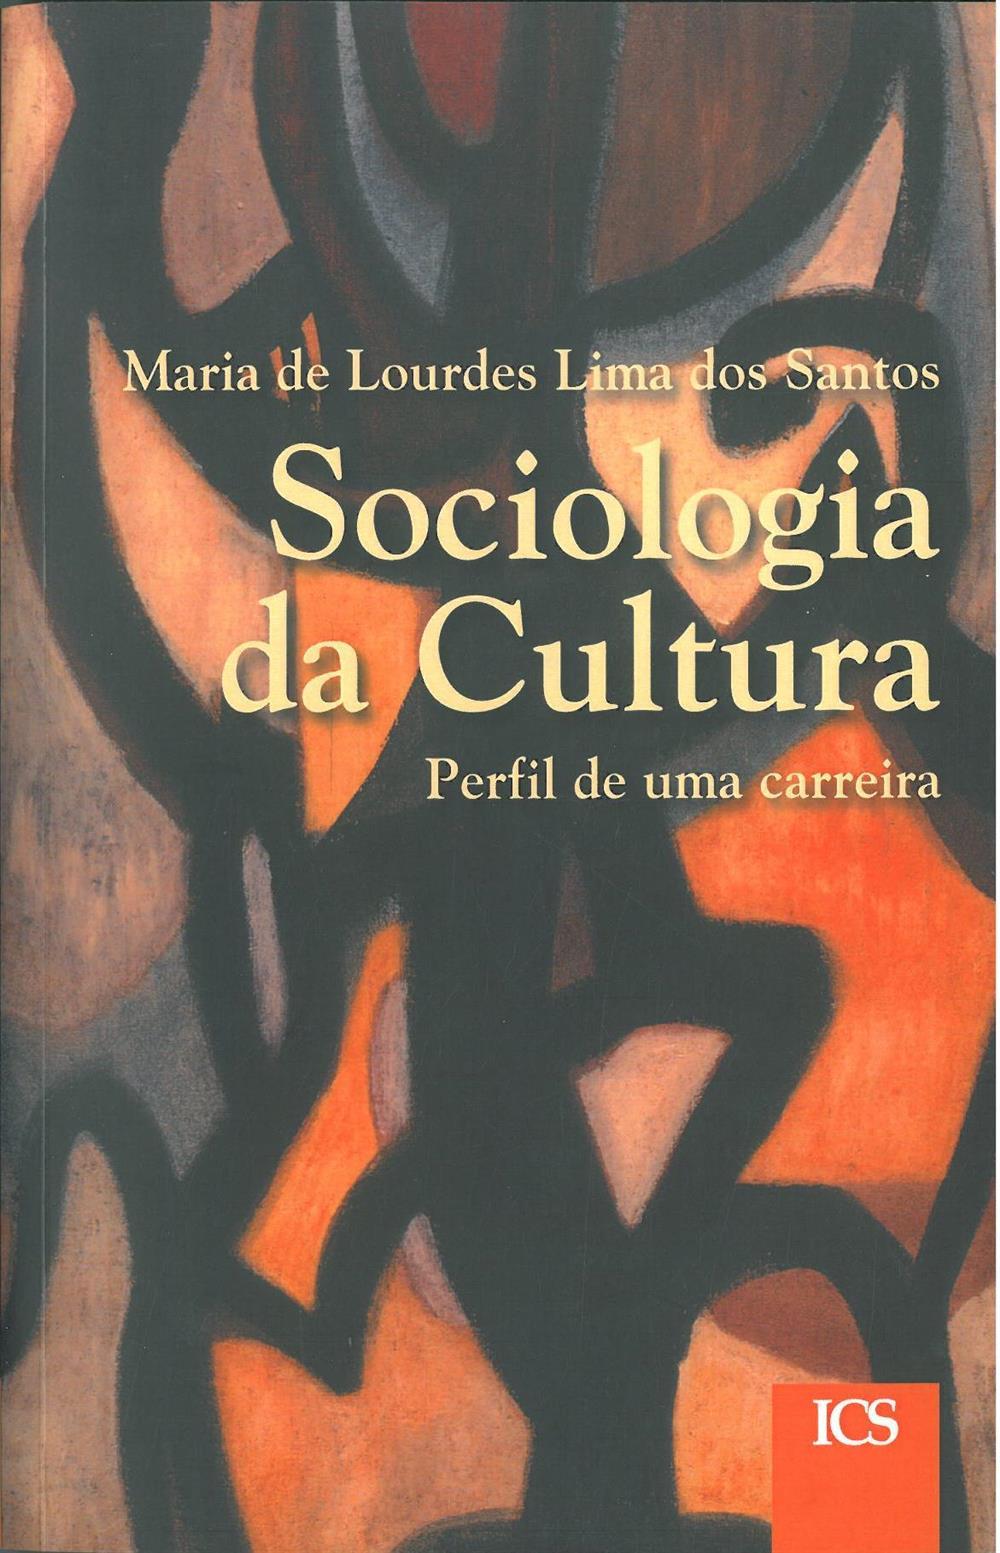 Sociologia da cultura.jpg